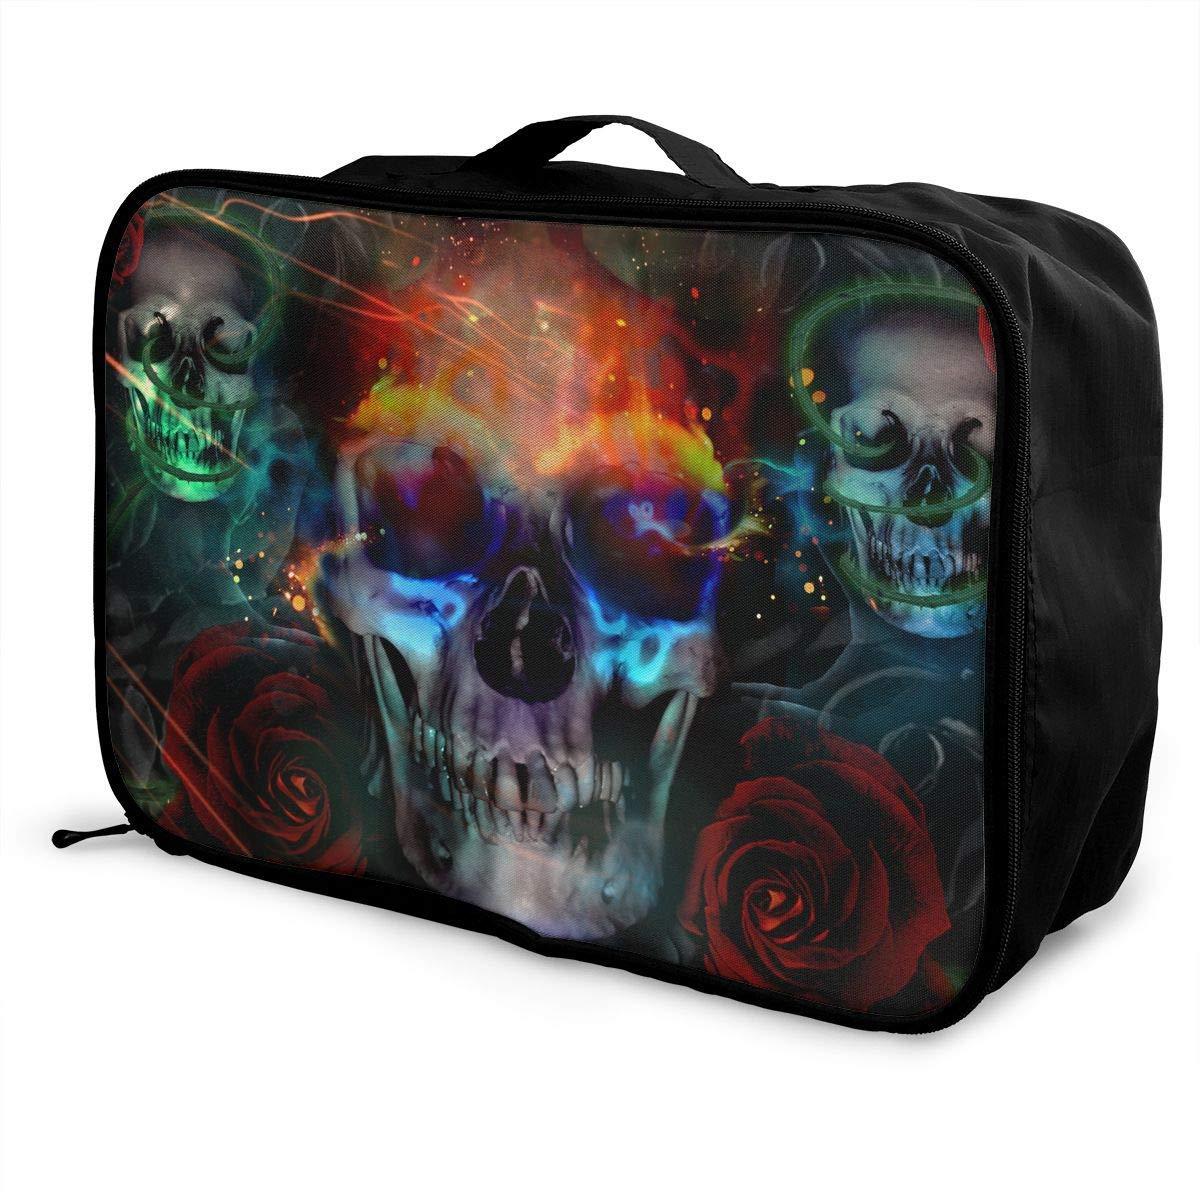 JTRVW Luggage Bags for Travel Lightweight Large Capacity Portable Duffel Bag for Men /& Women Rose Fire Skull Travel Duffel Bag Backpack